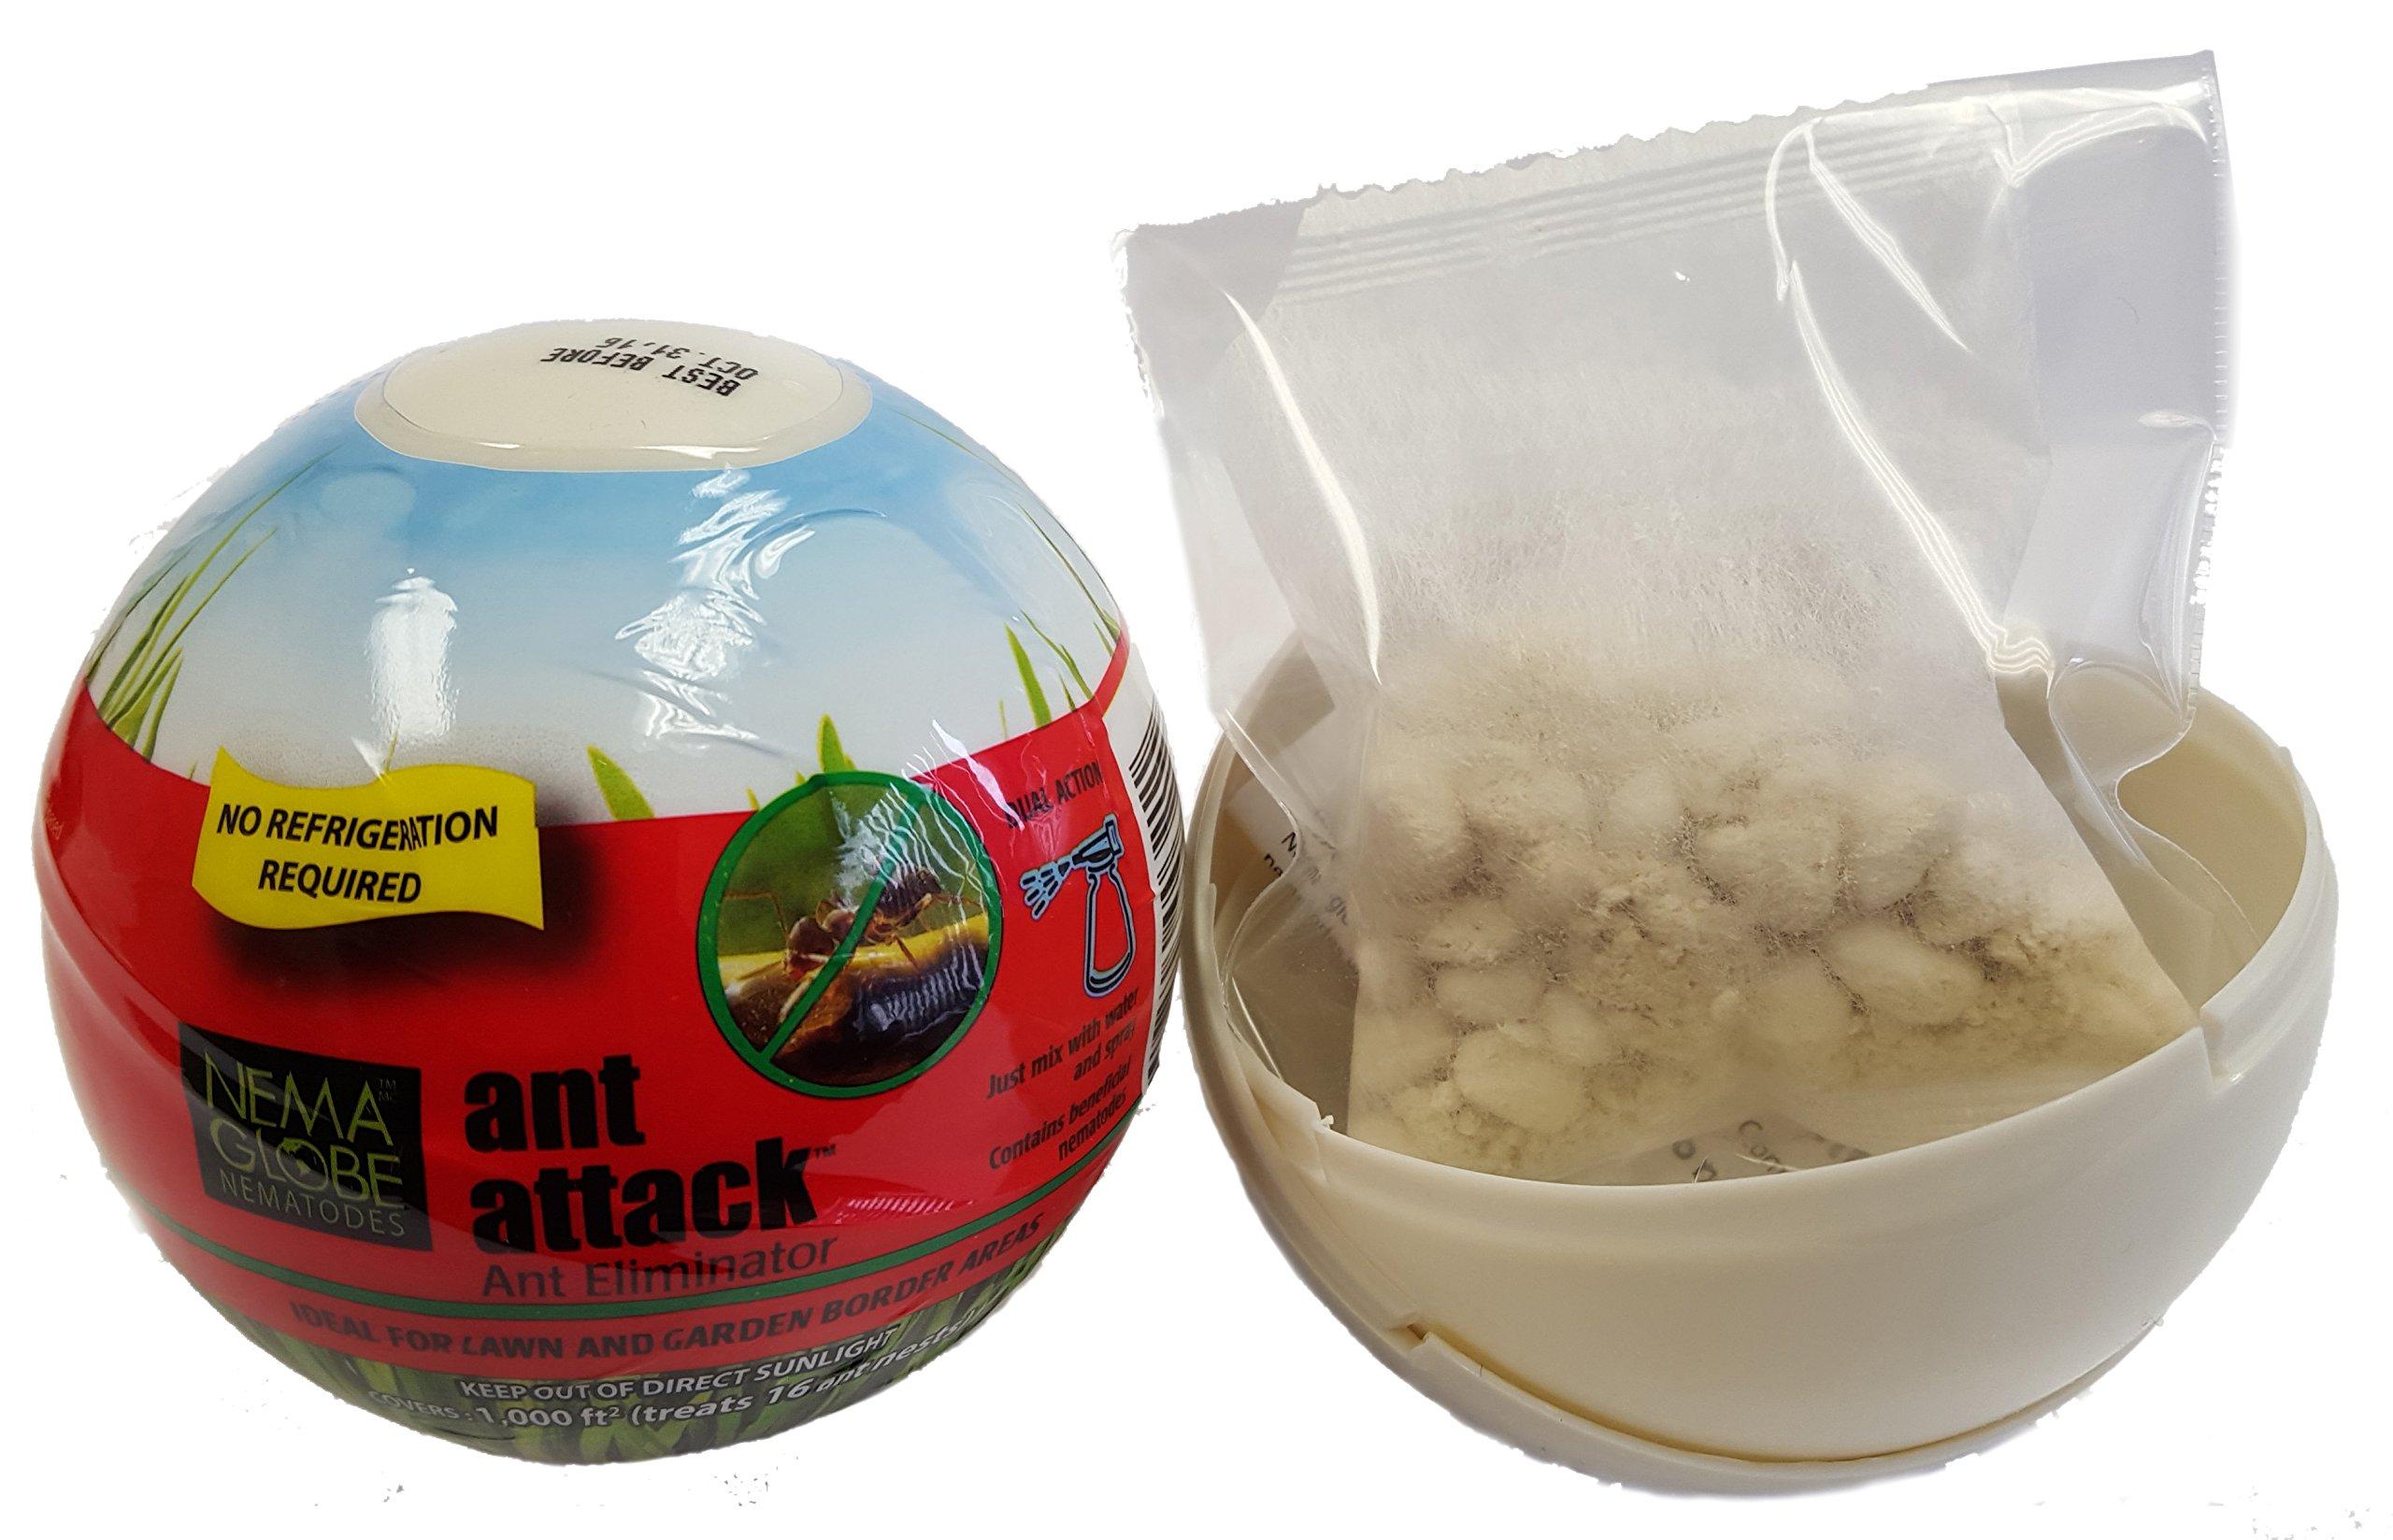 10 million Beneficial Nematodes (S.feltiae) - Nema Globe Ant Attack Tick and Pest Control New''No Refrigeration Required'' Formula by Nemaglobe (Image #2)